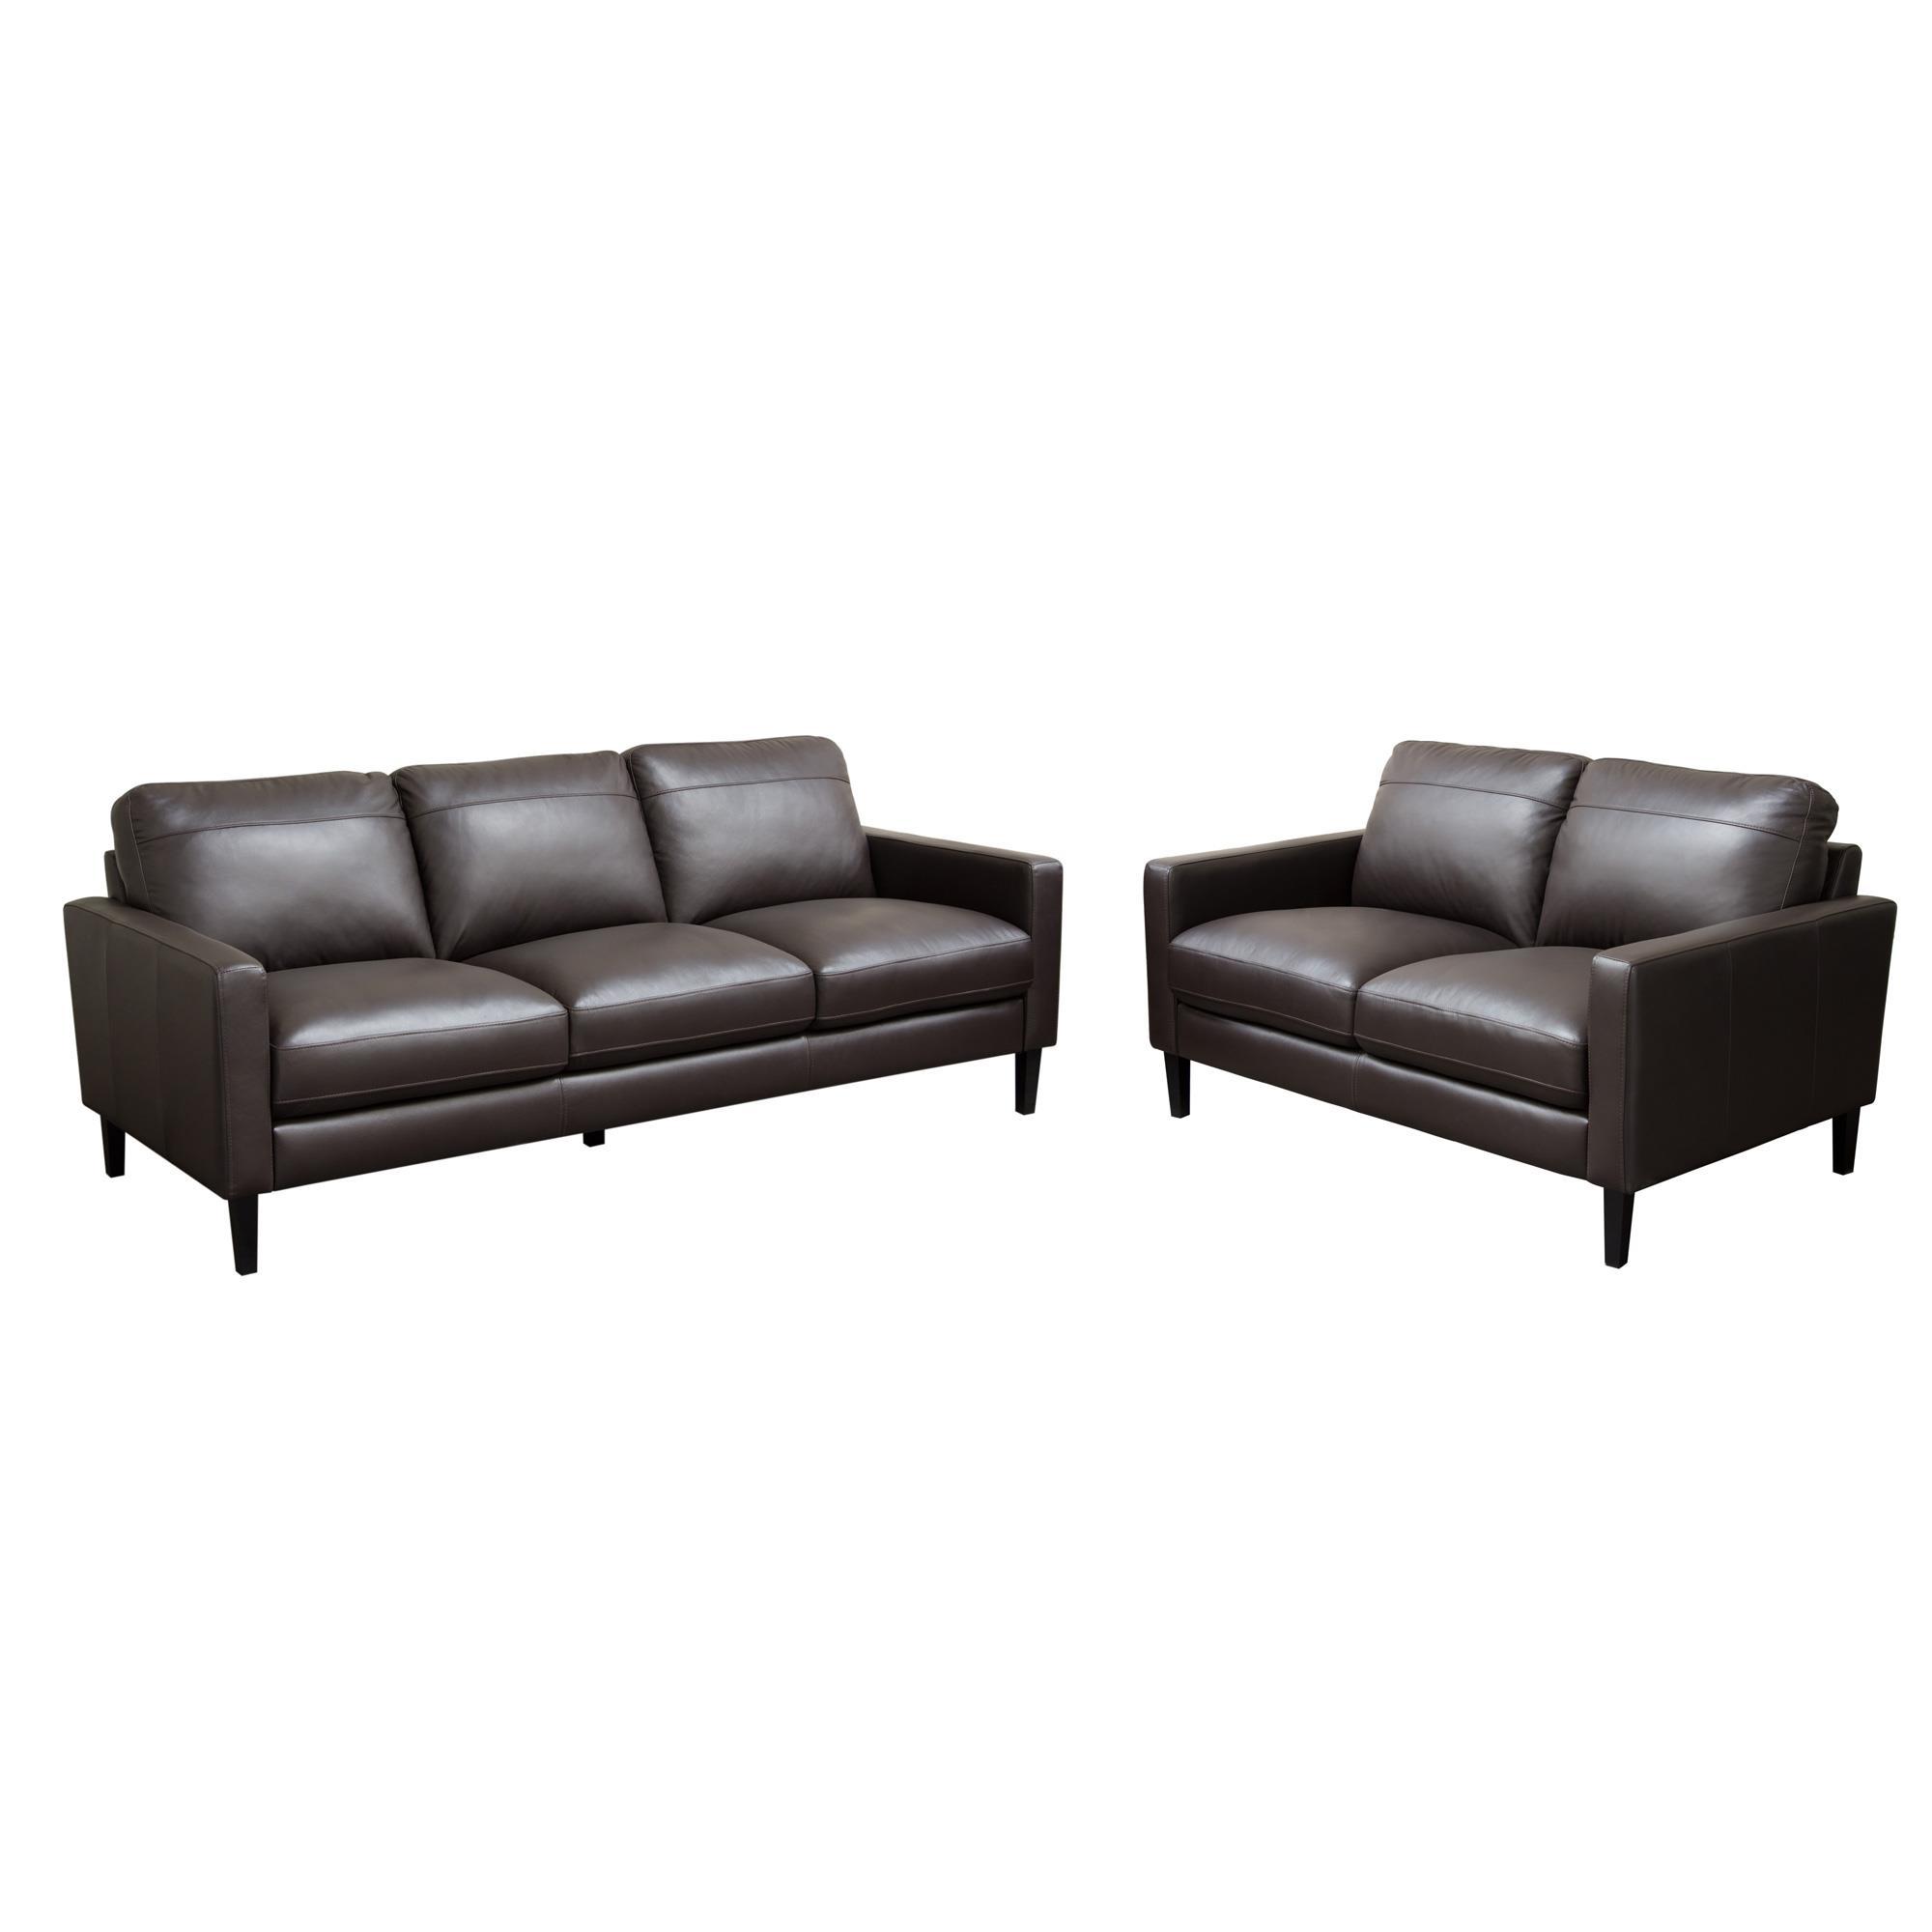 Diamond Sofa Omega Full Leather Sofa & Loveseat 2PC Set - Item Number: OMEGASLDC